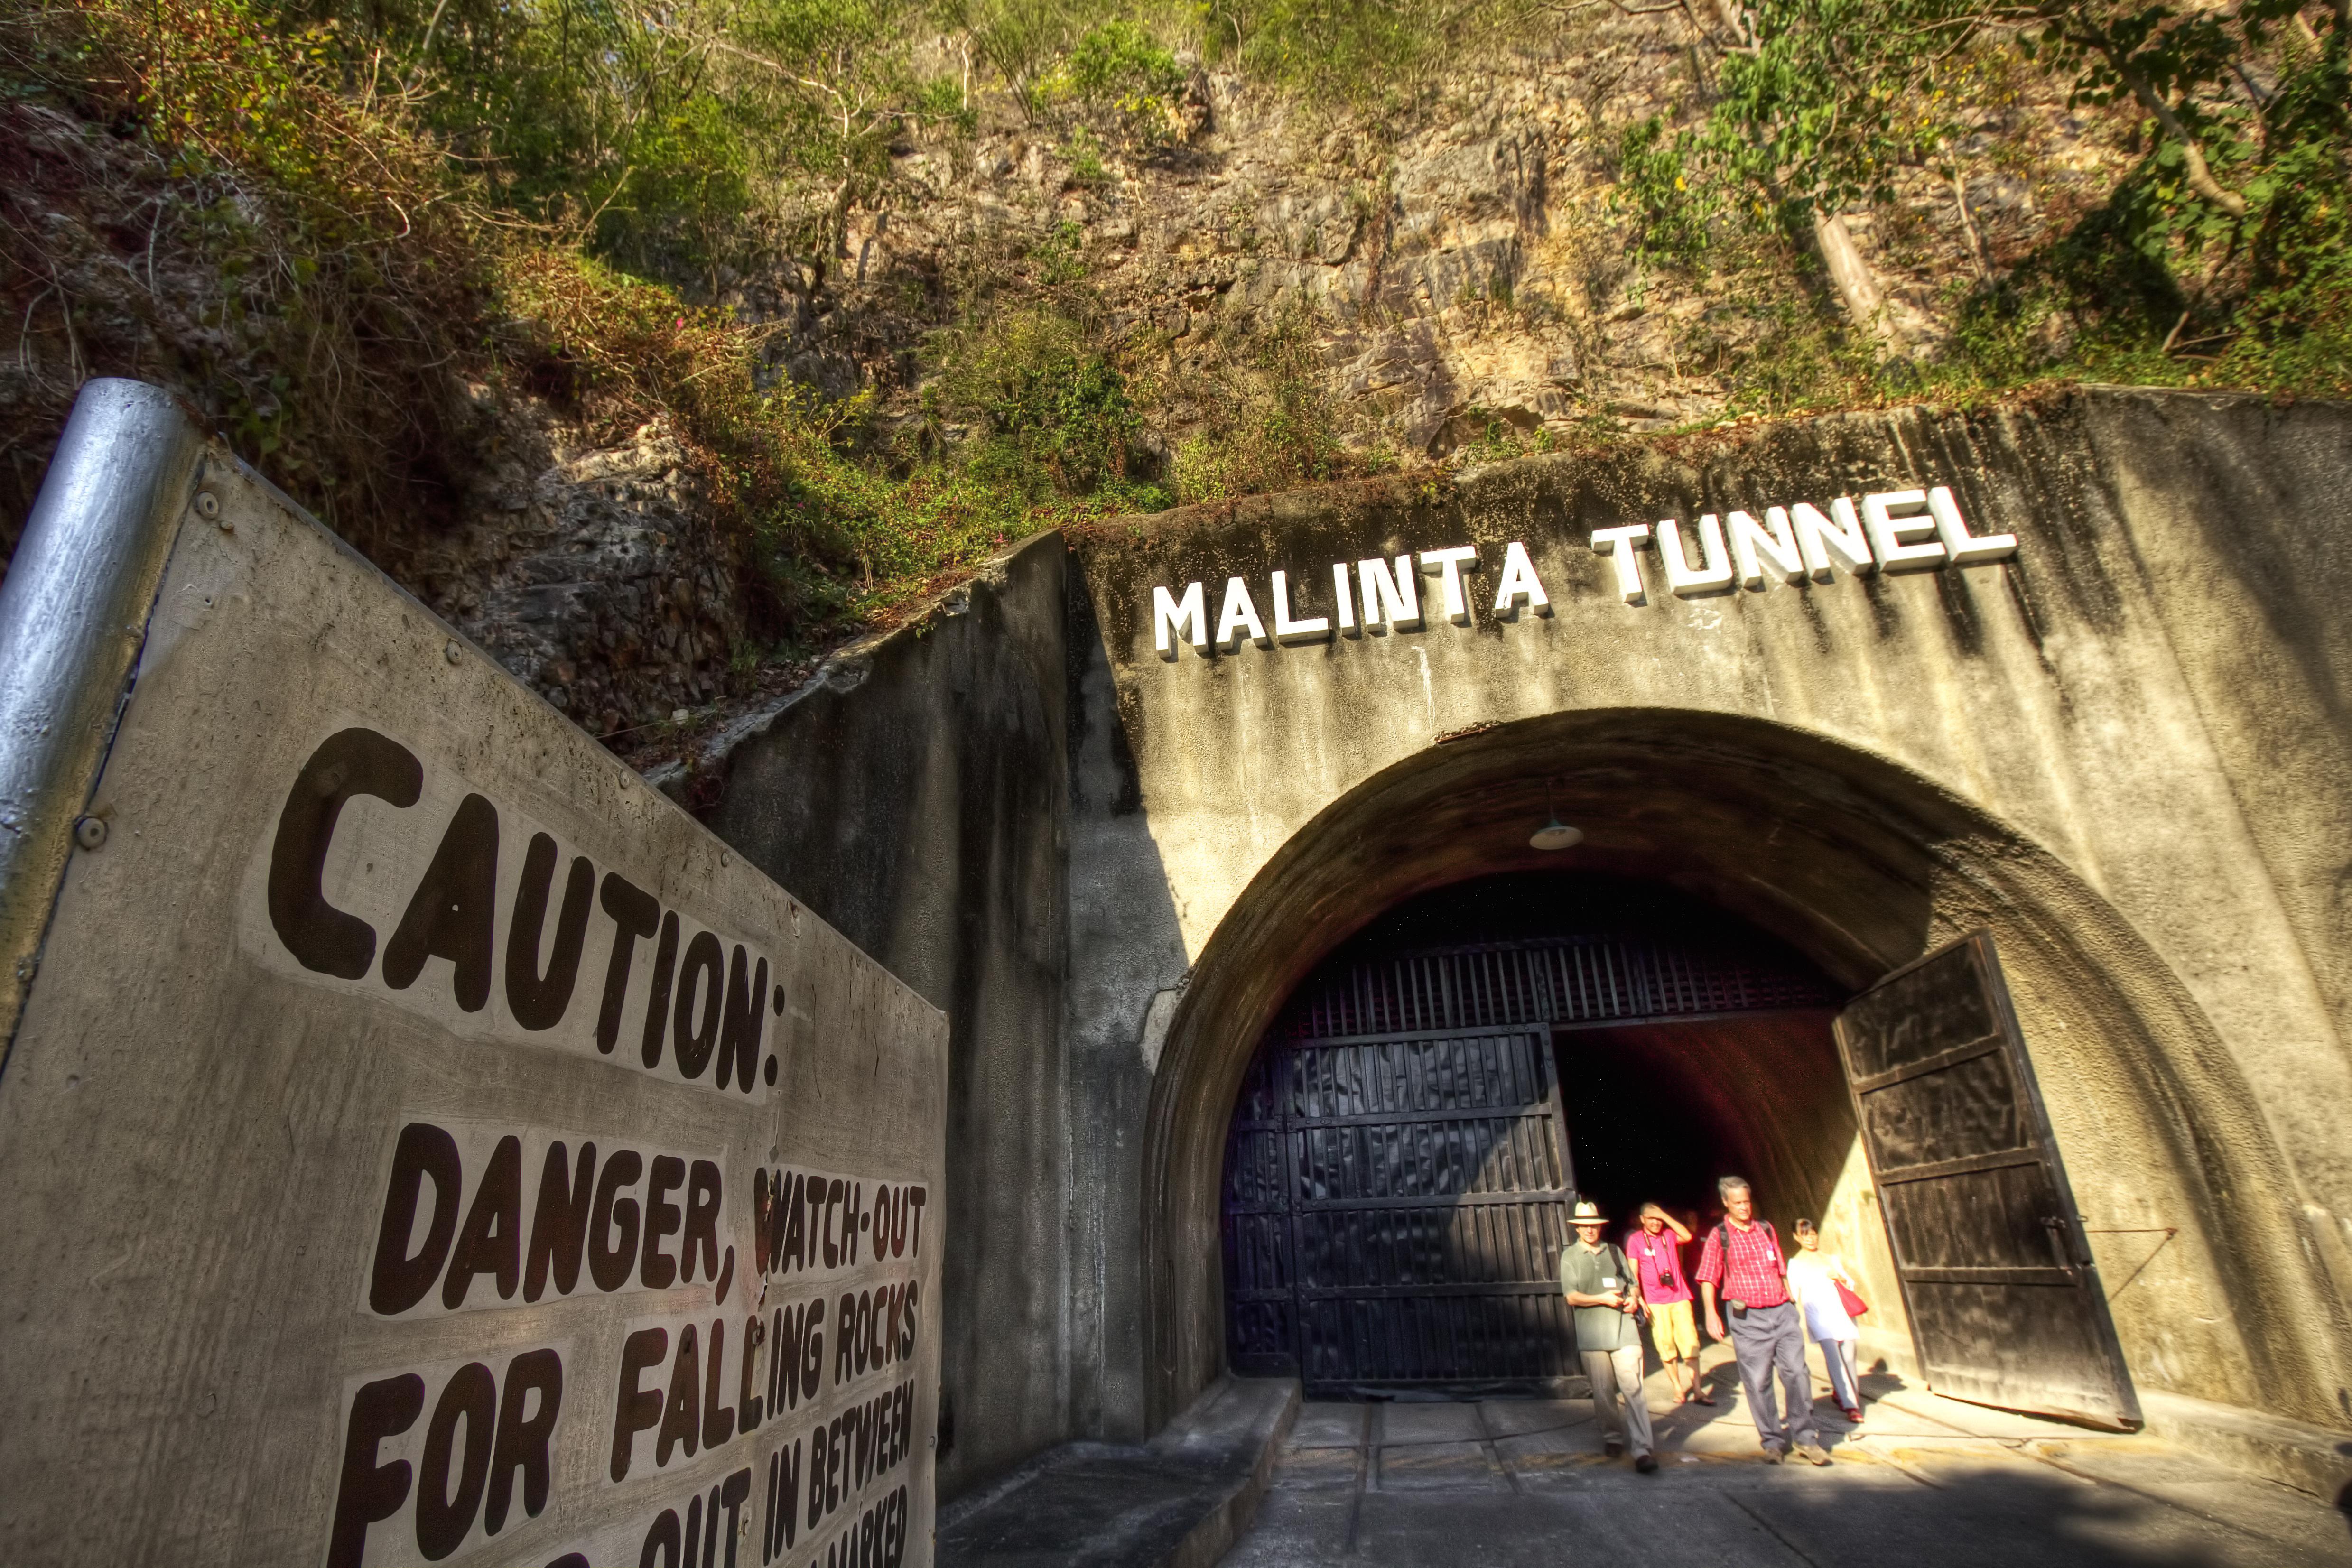 Malinta Tunnel Located File:malinta Tunnel